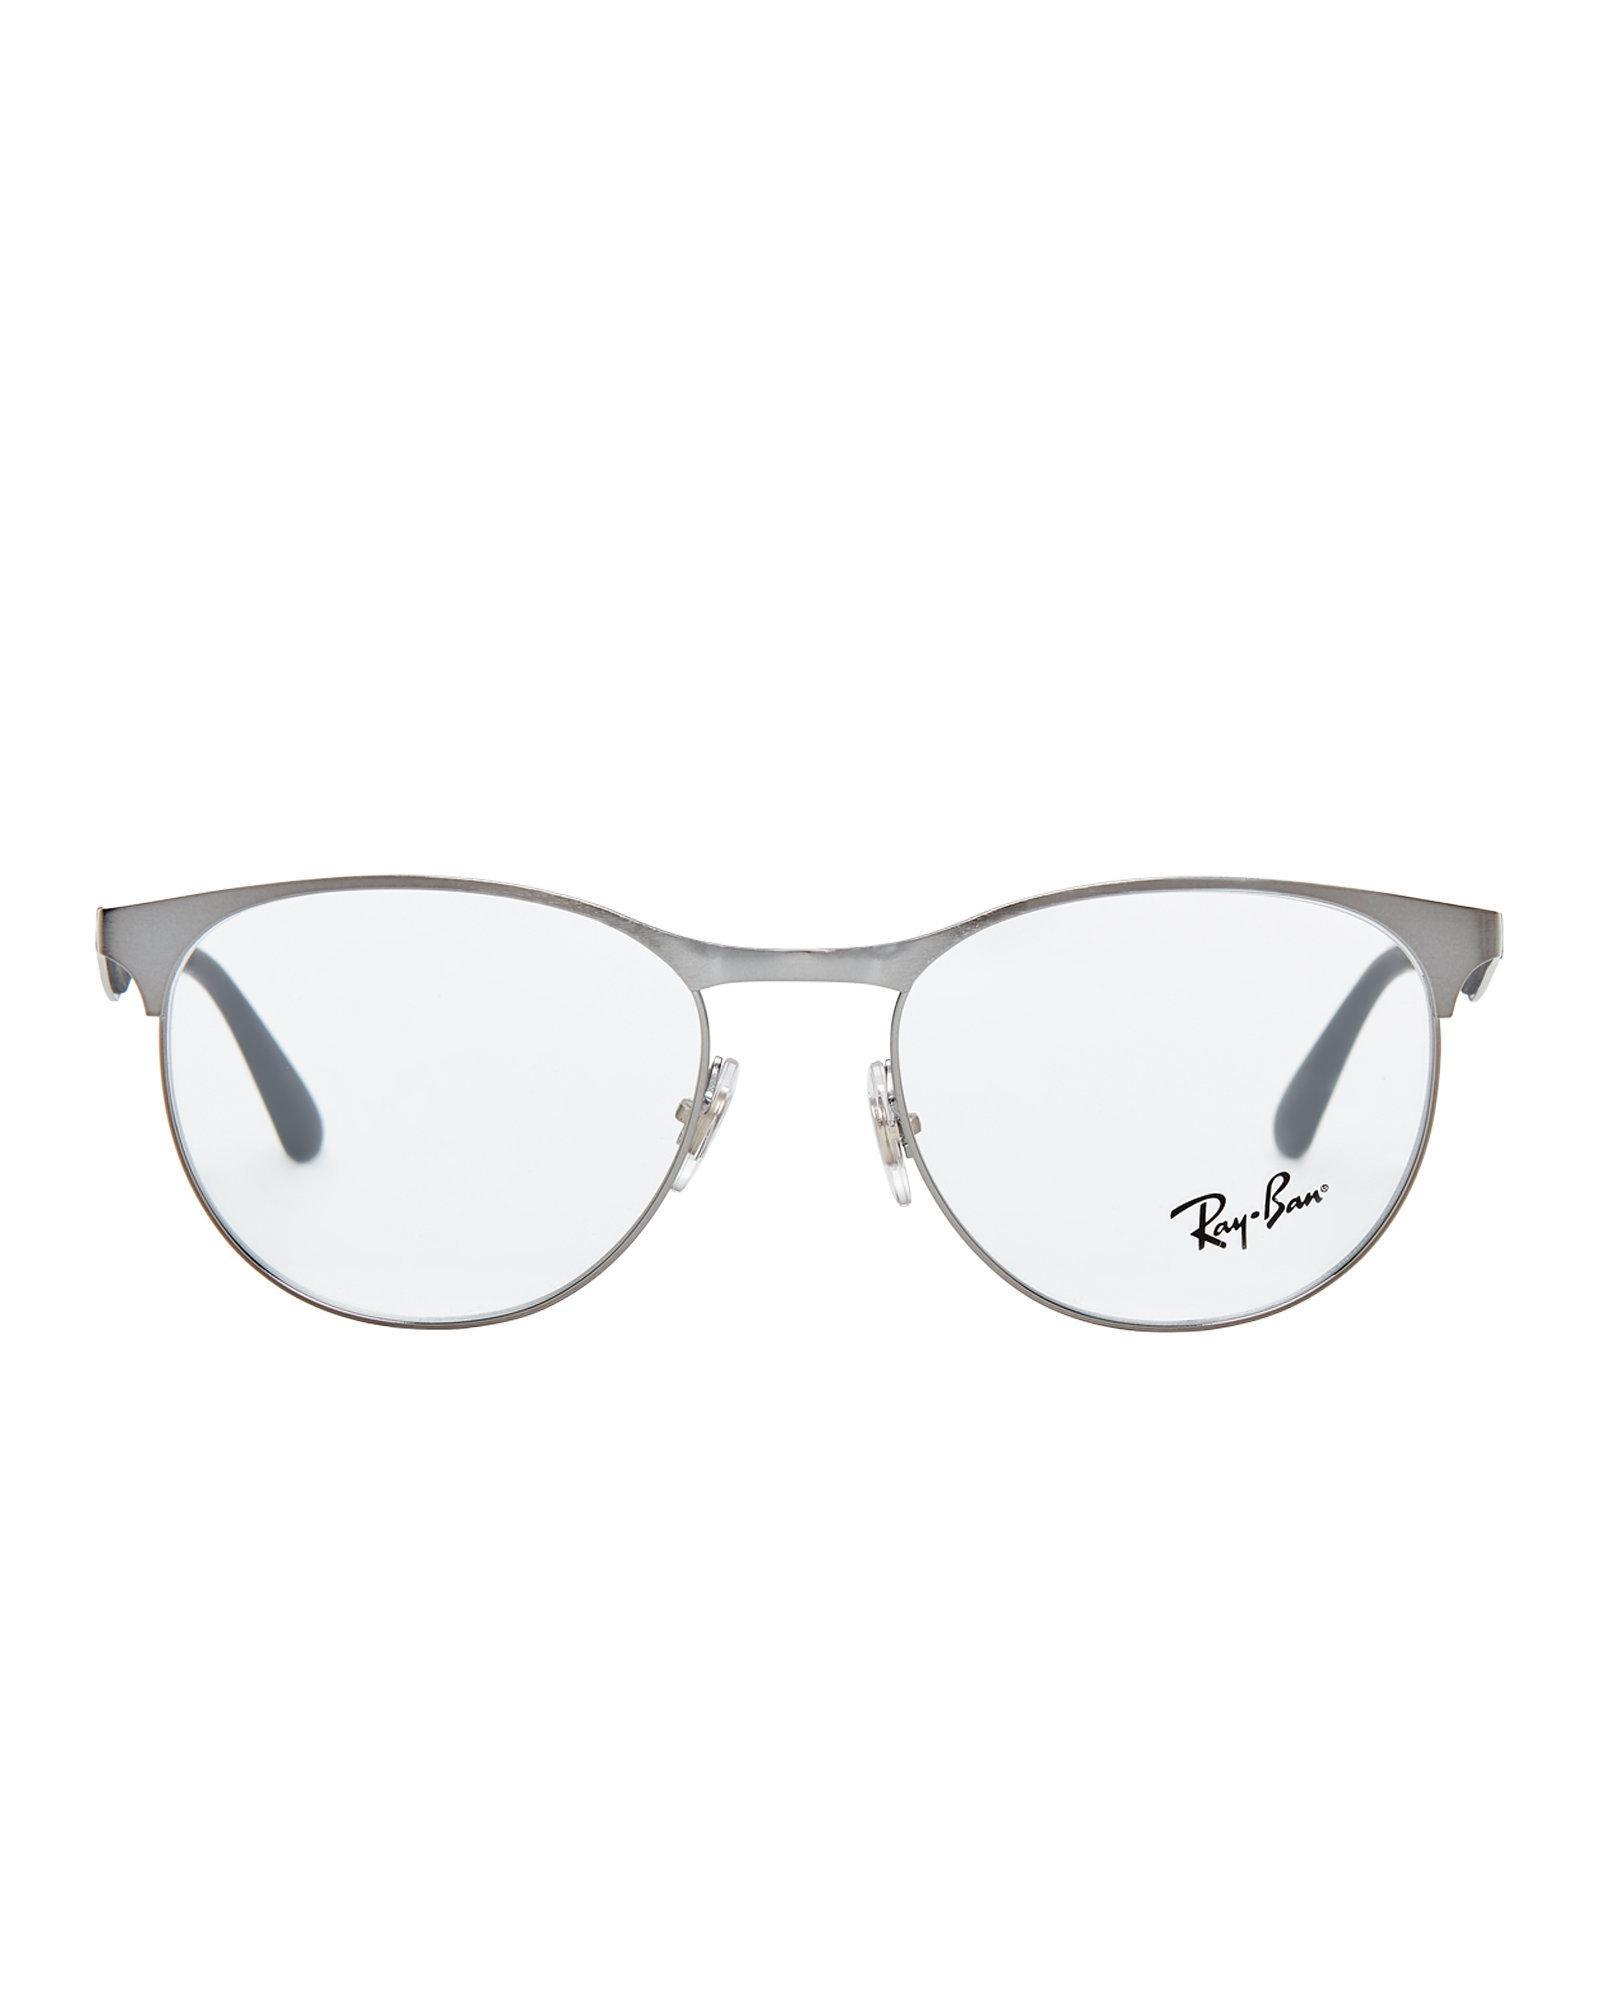 Lyst - Ray-Ban Rb 6365 Ruthenium-tone Semi-rimless Optical Frames